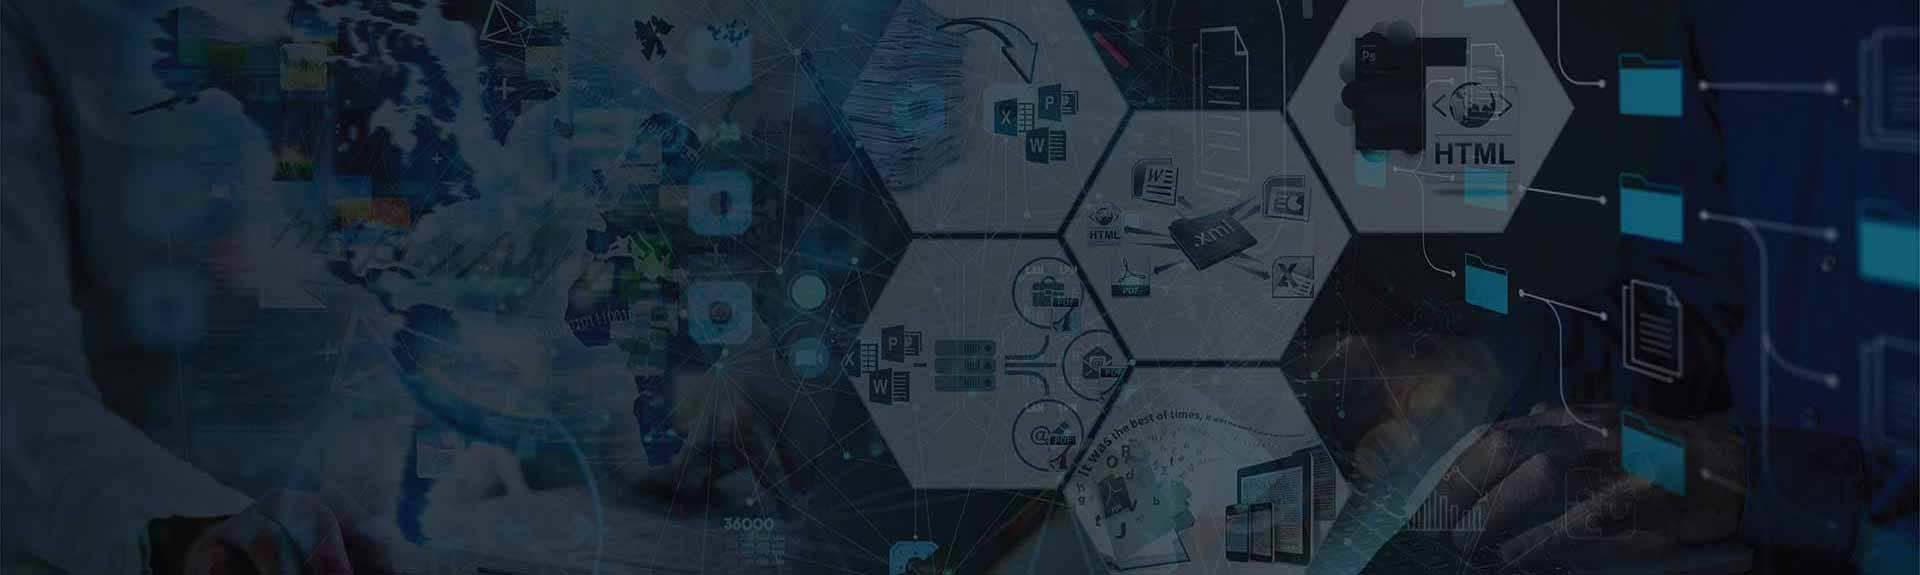 Data Conversion Services Banner